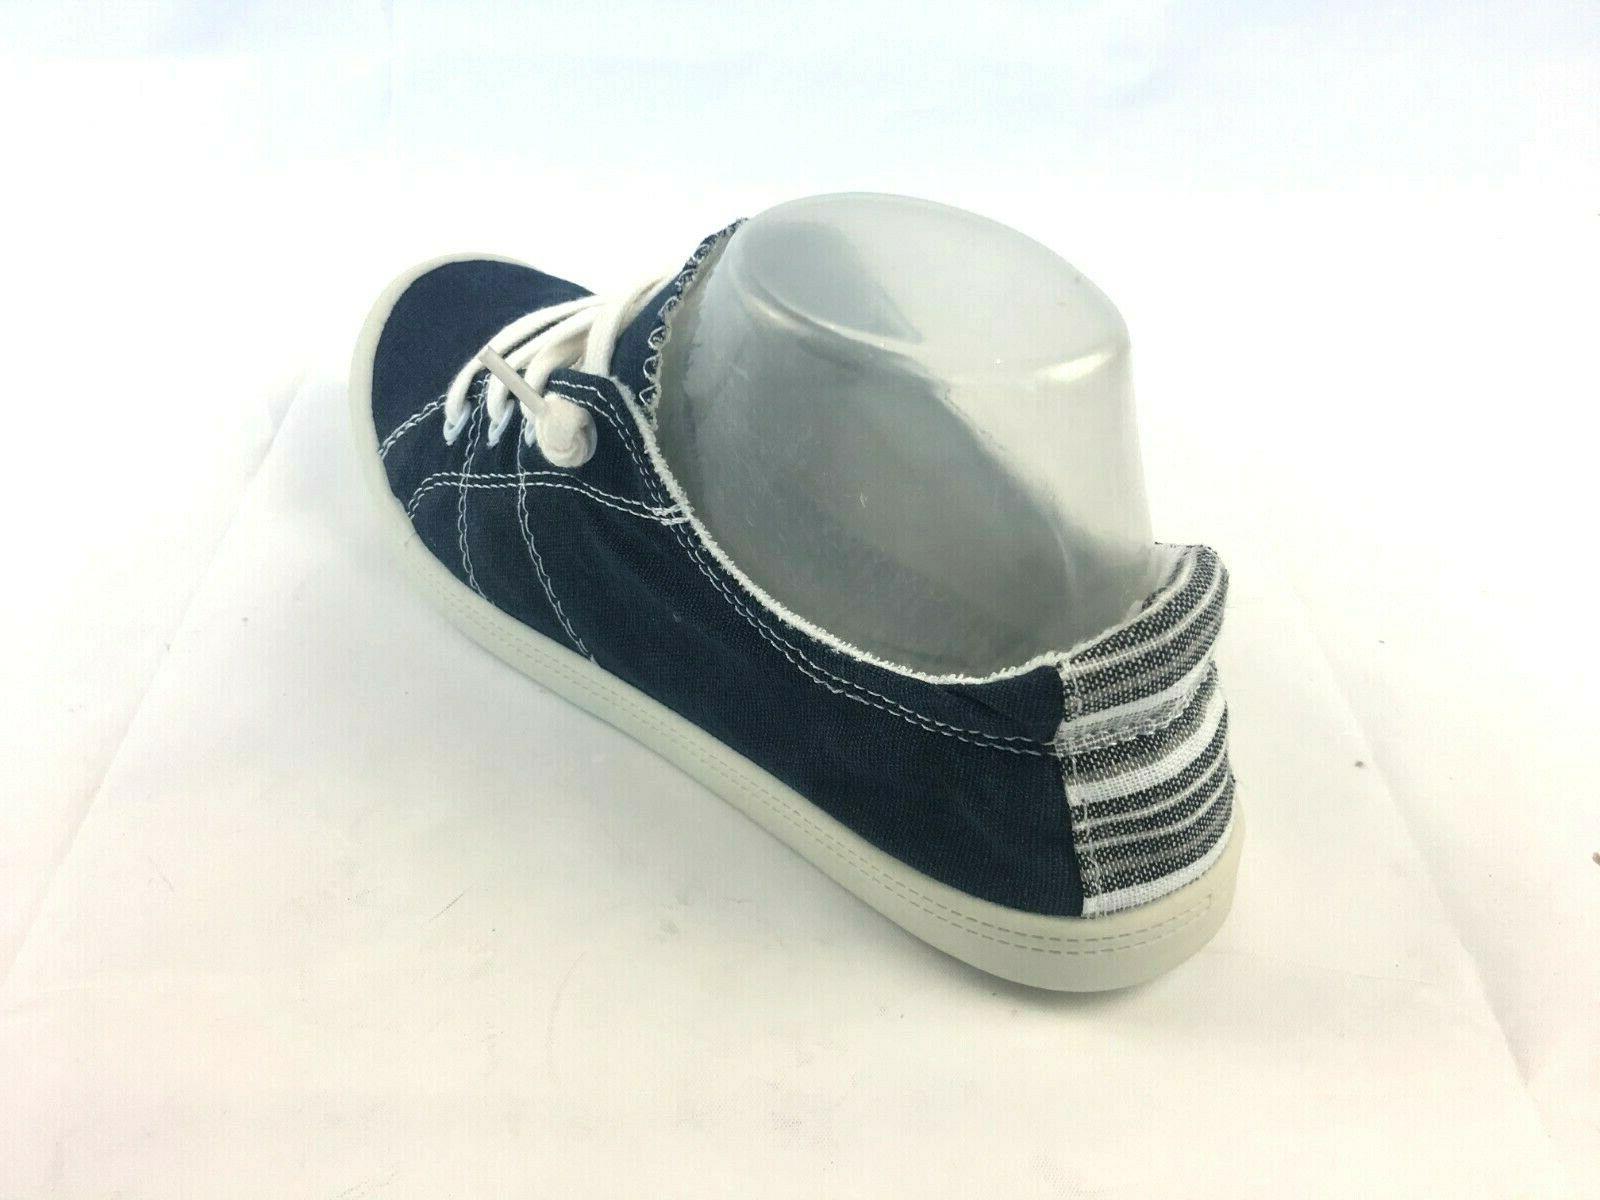 New Lace Up Canvas Shoes Comfy 5-10